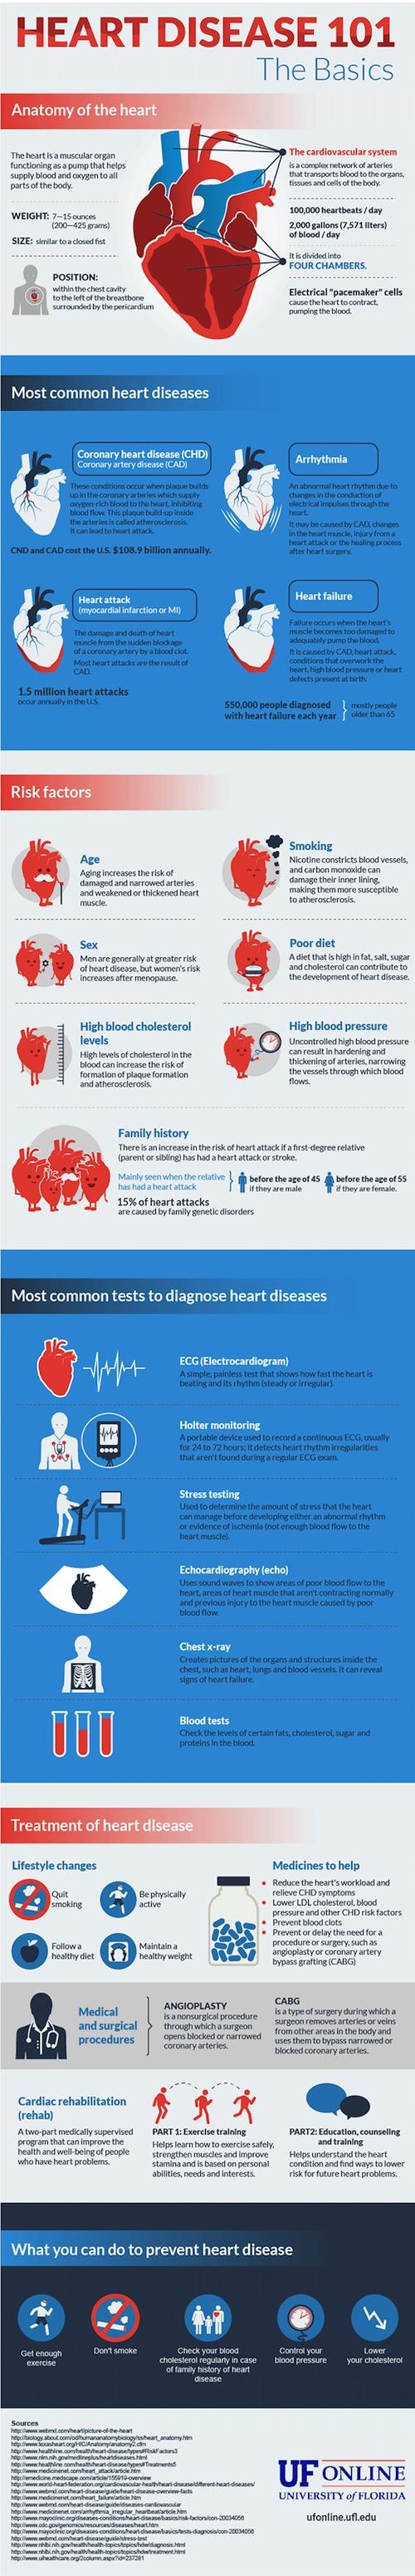 heart-disease-101-the-basics